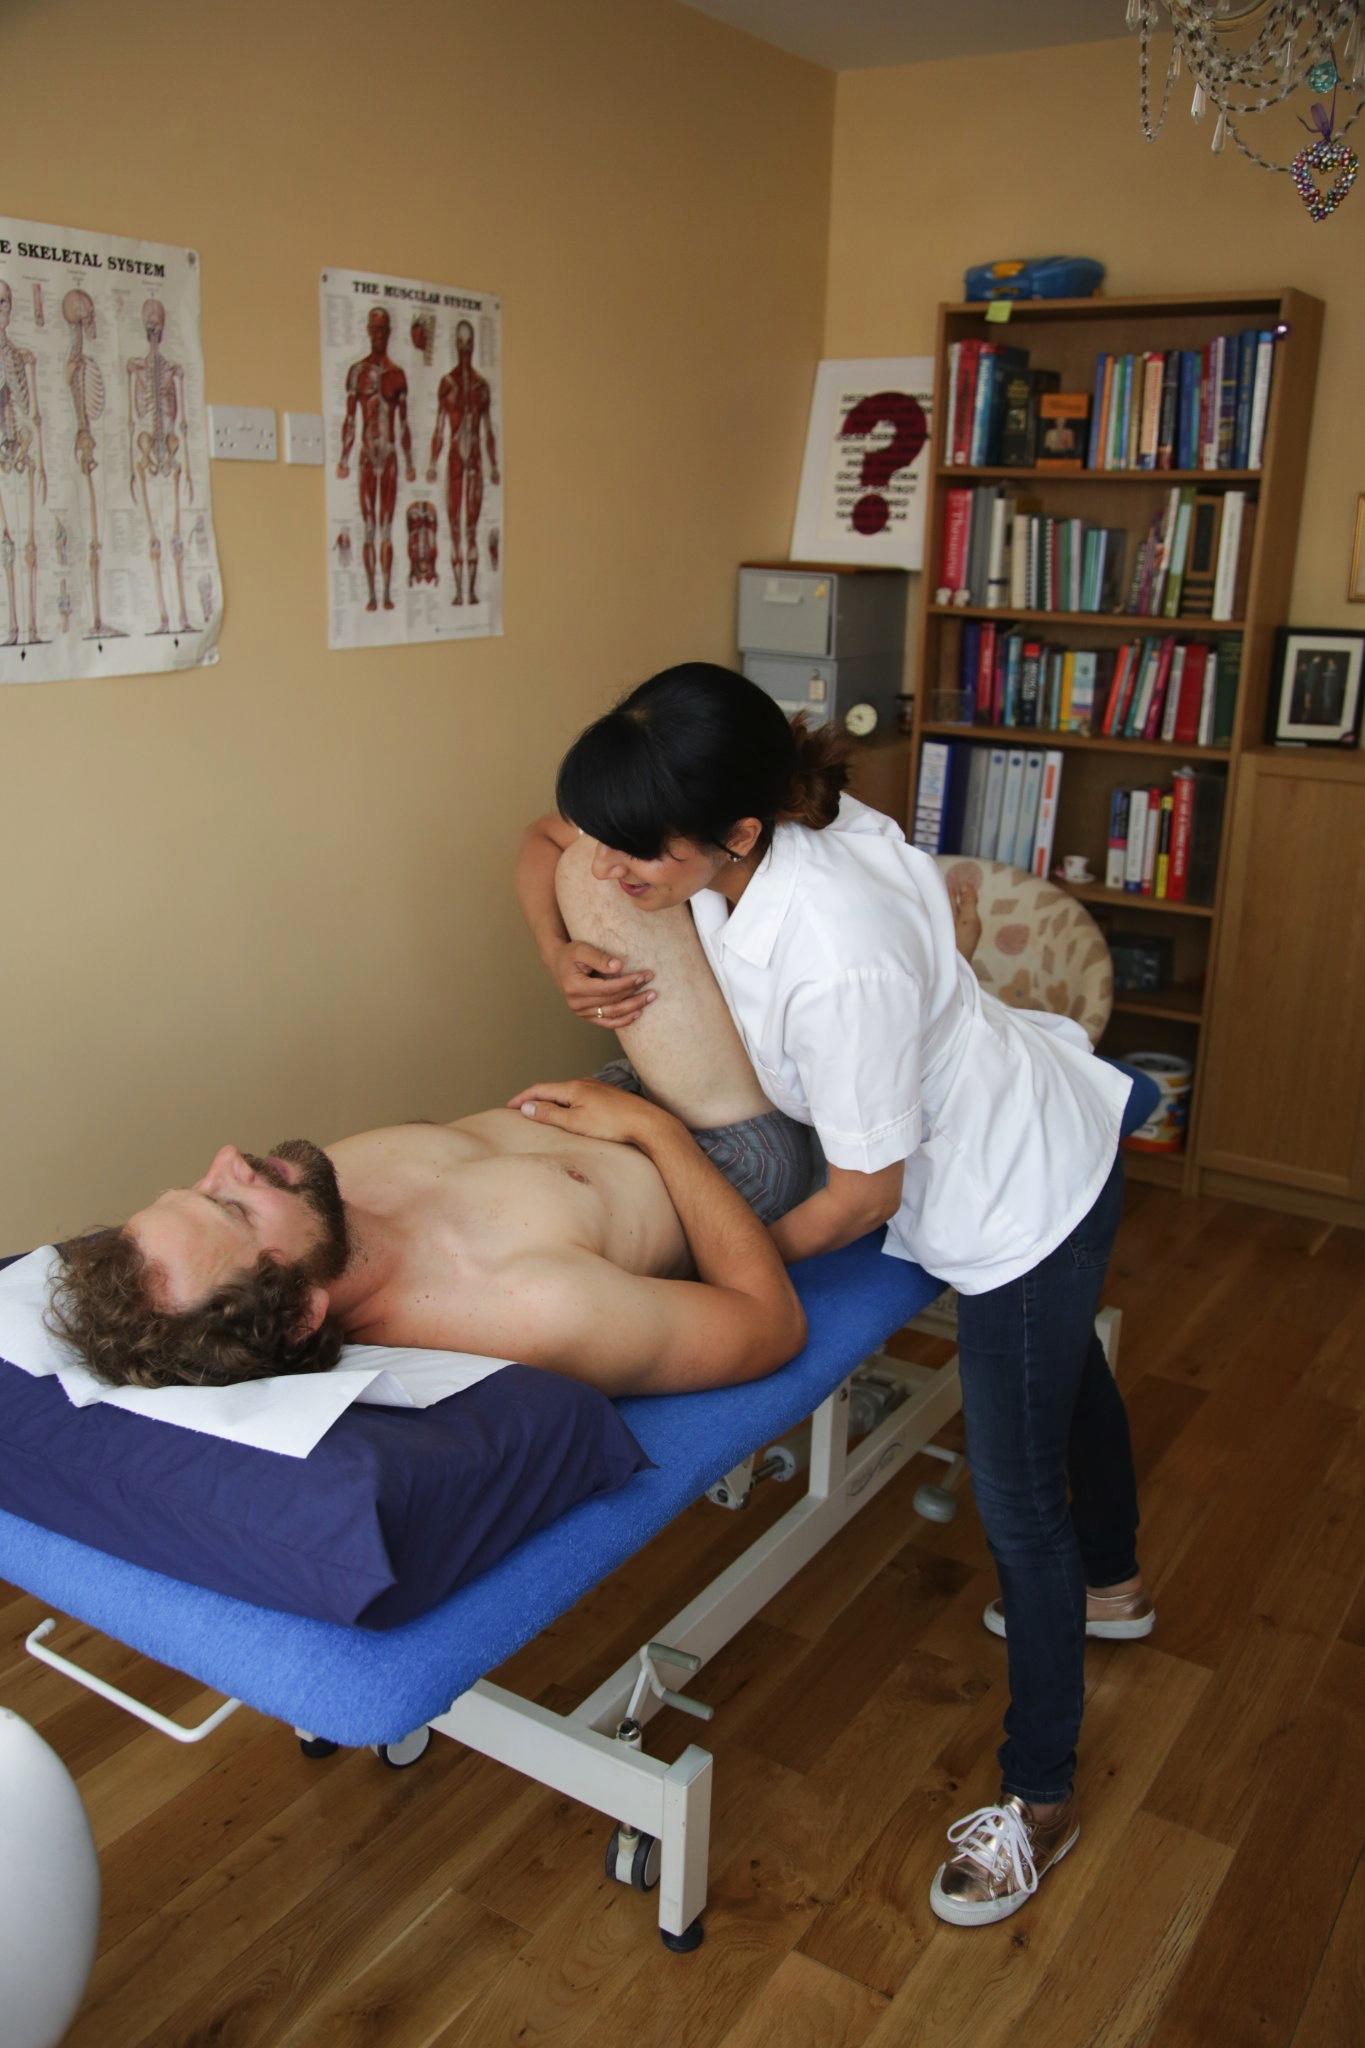 LYB Man Patient 2